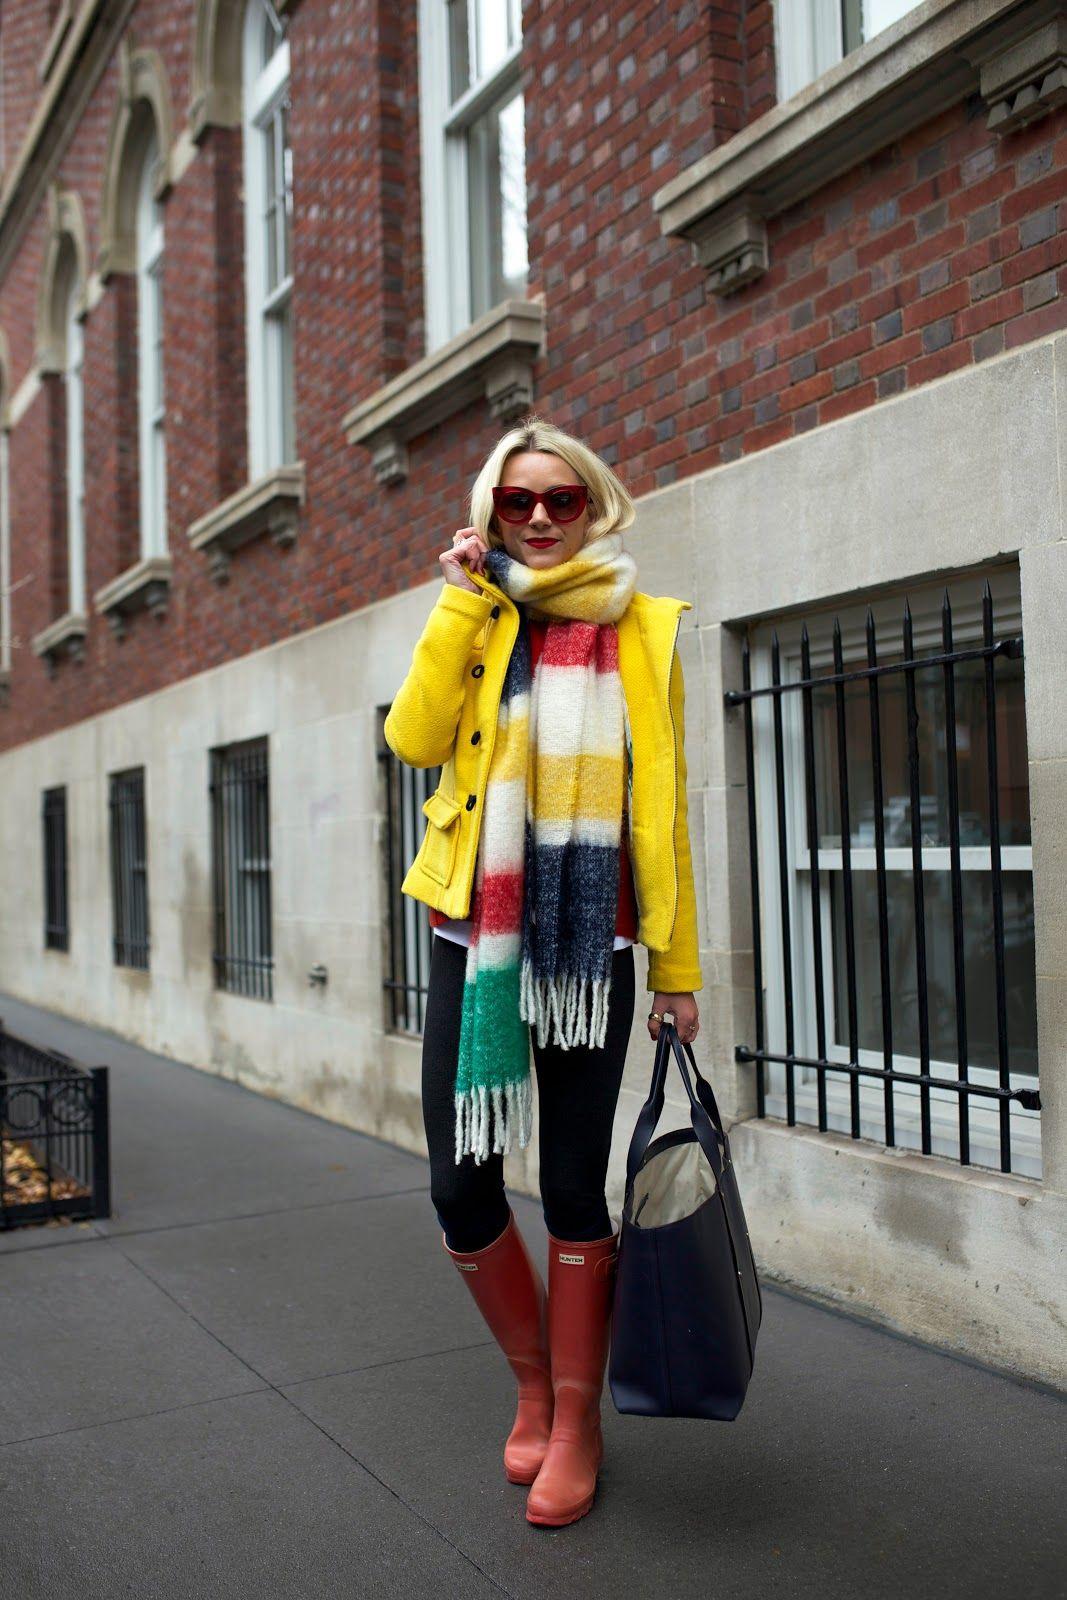 Colour combination colorful rainy outfit hunter boot ltd, fashion accessory